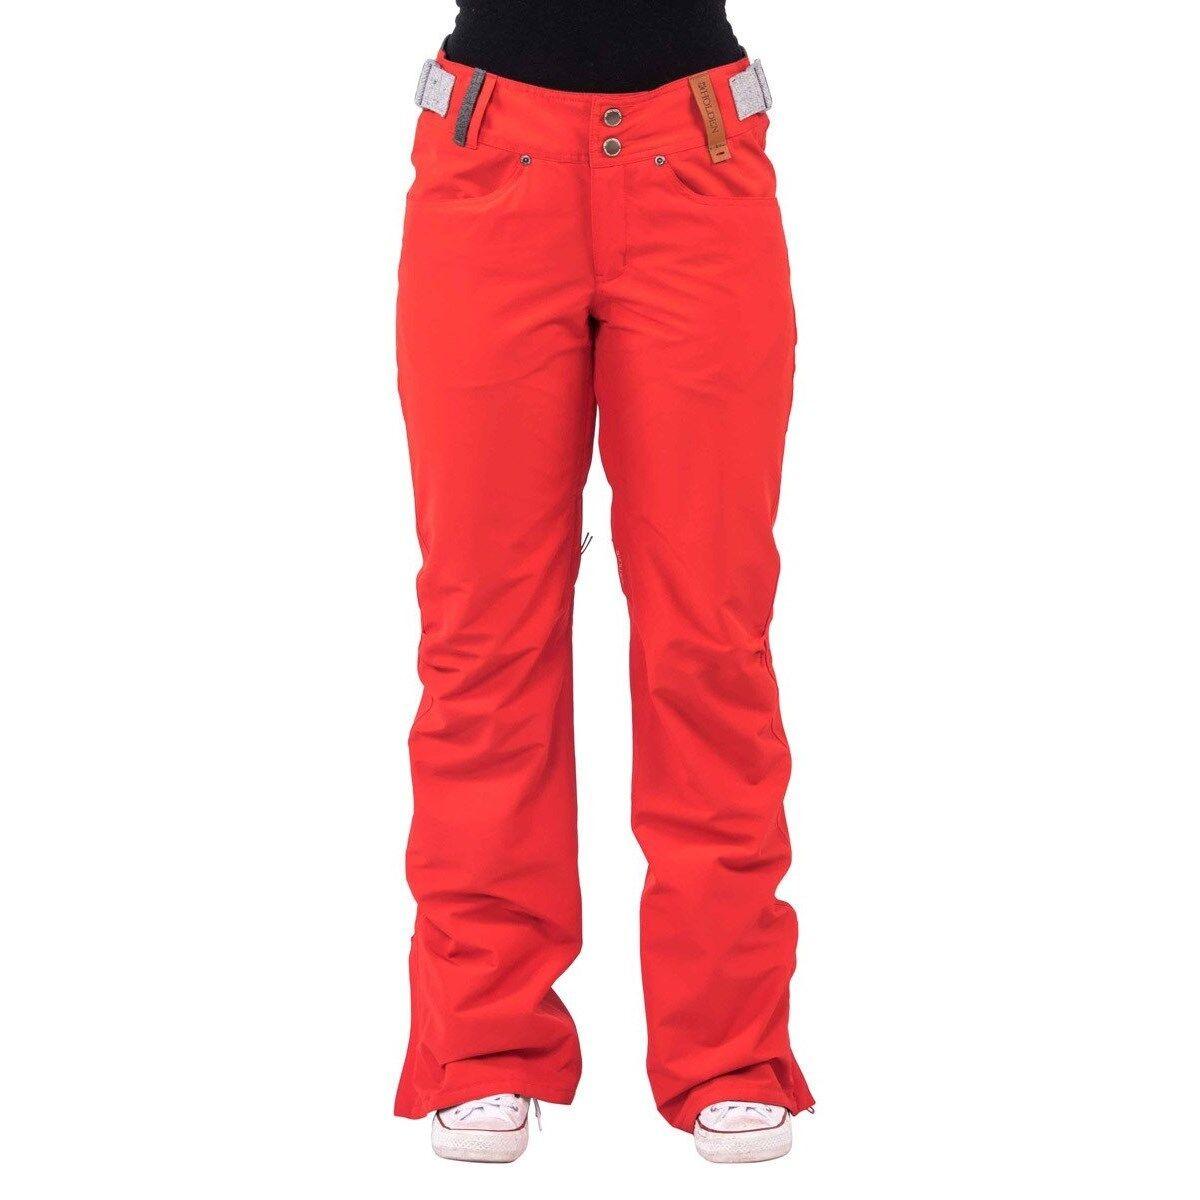 HOLDEN Women's STANDARD Snow Pants - Poppy - Large - NWT